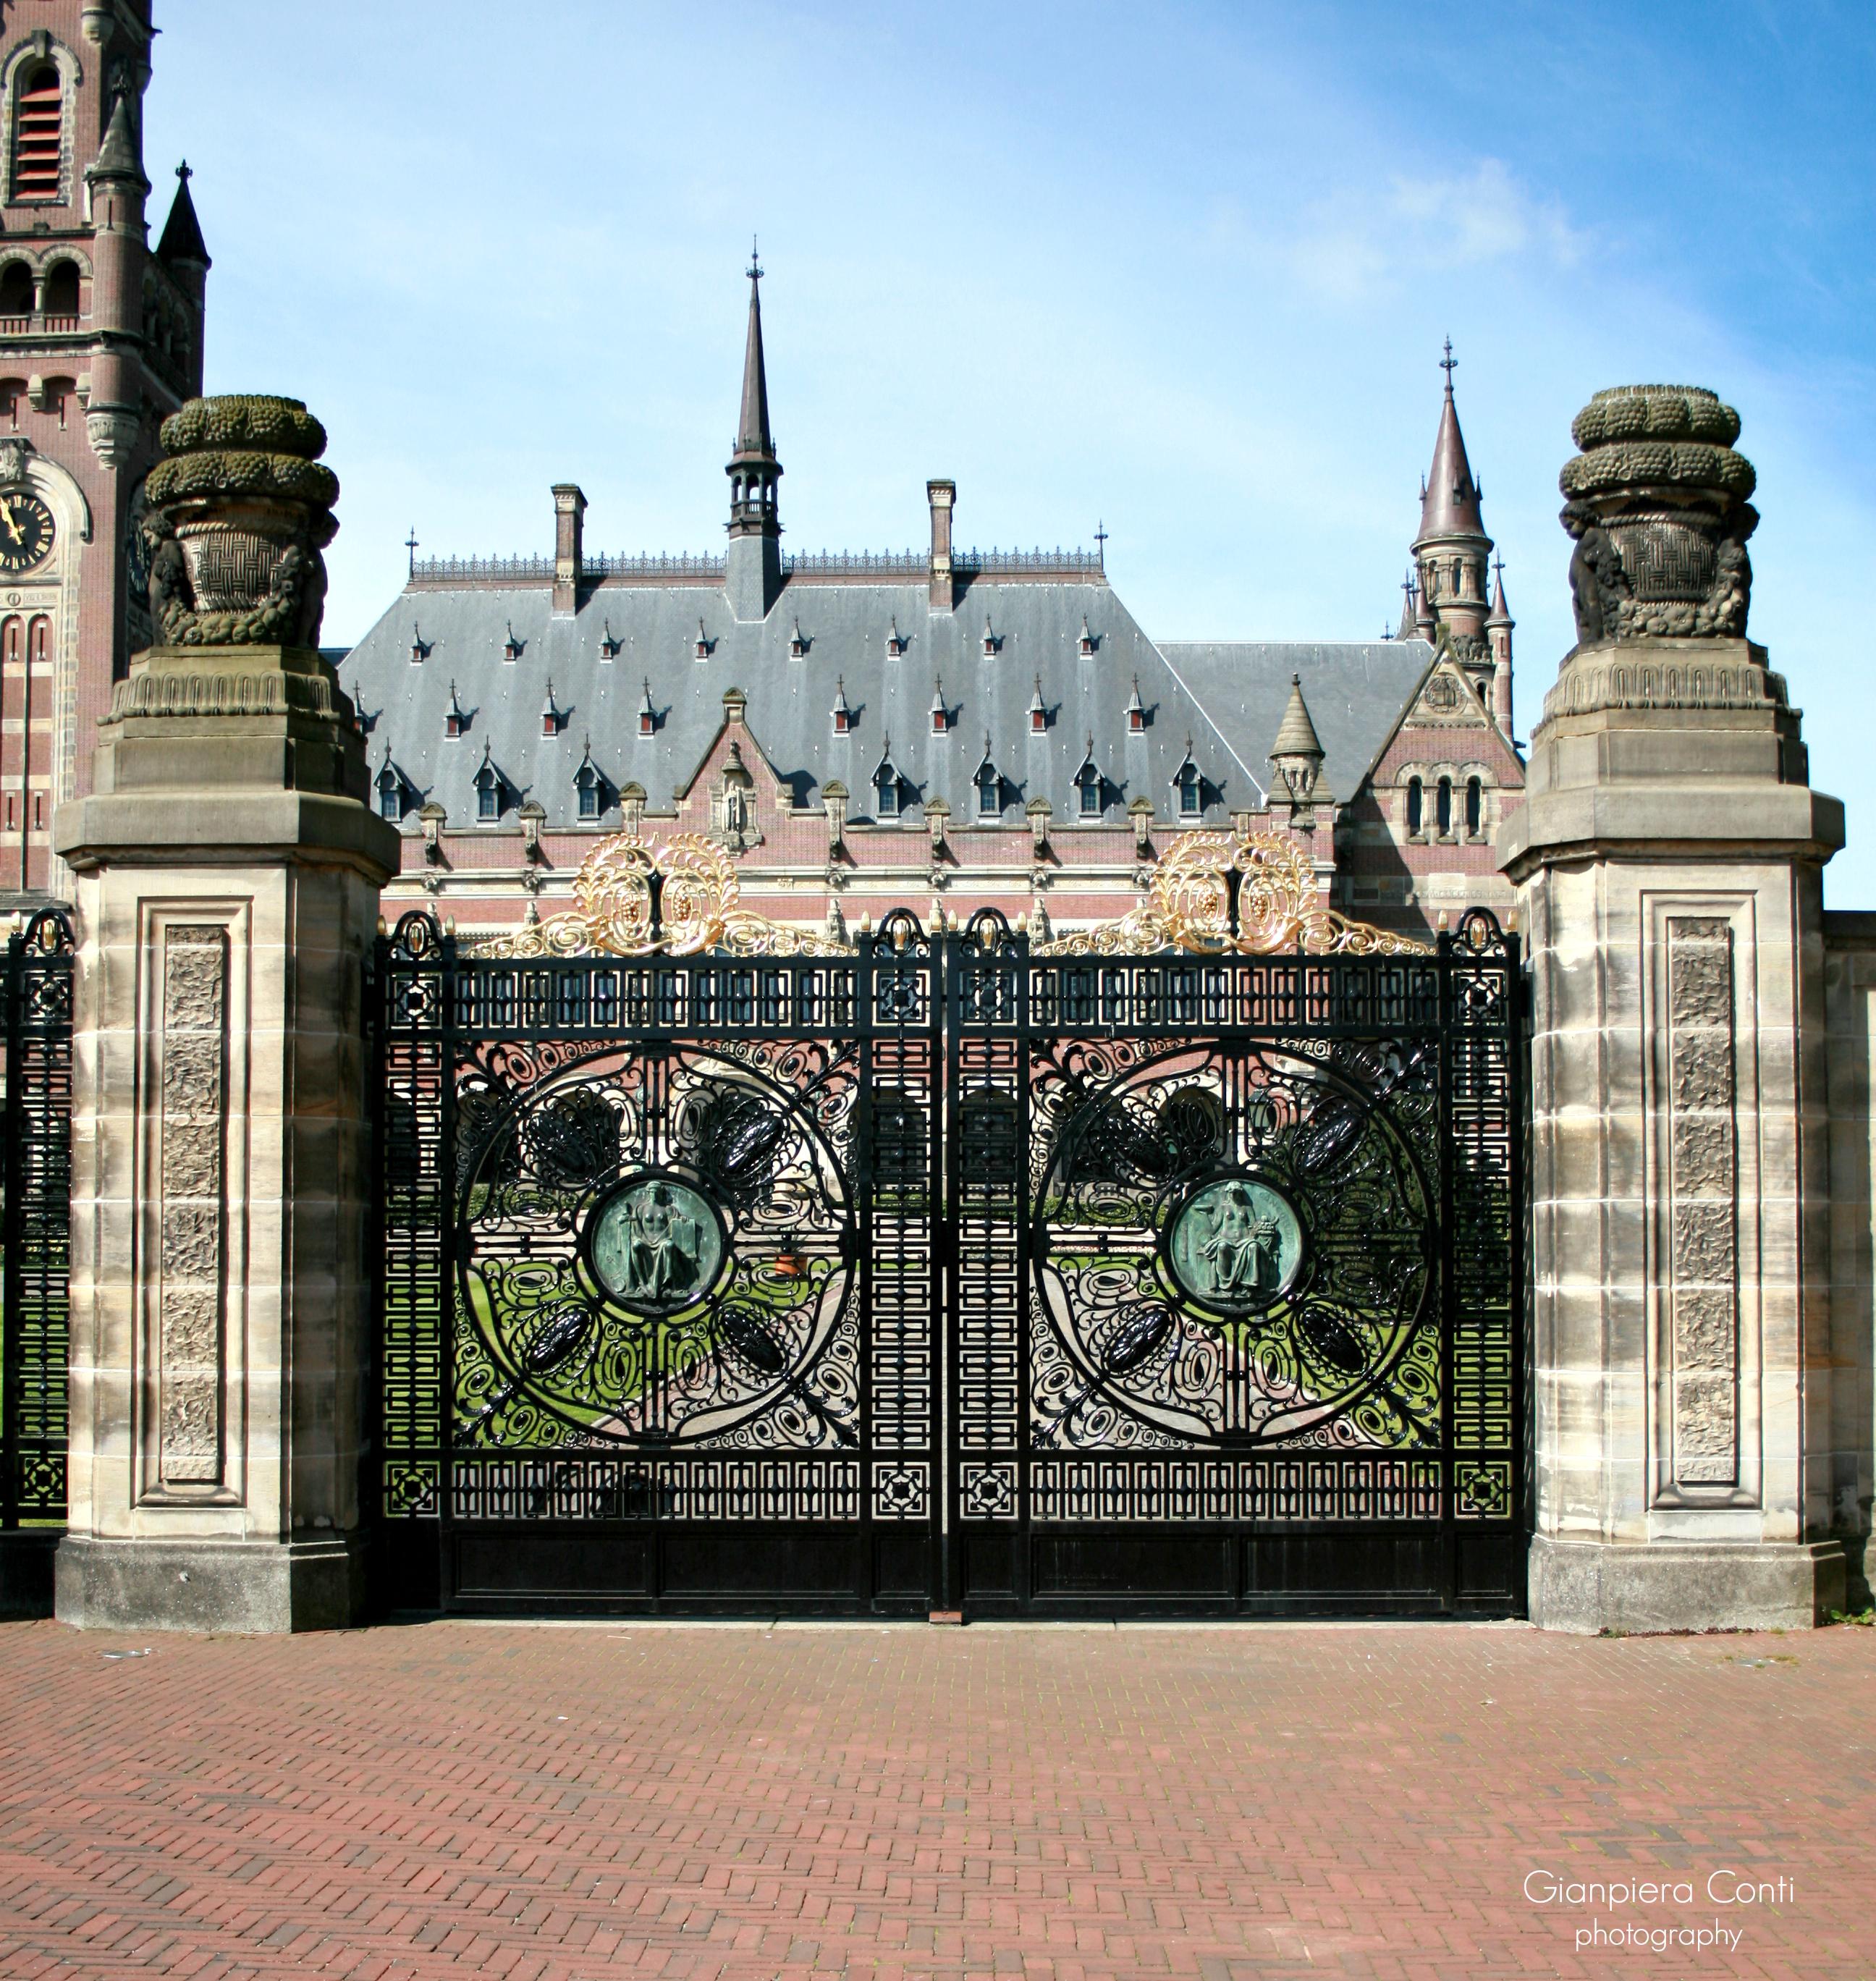 The Peace Palace Gate